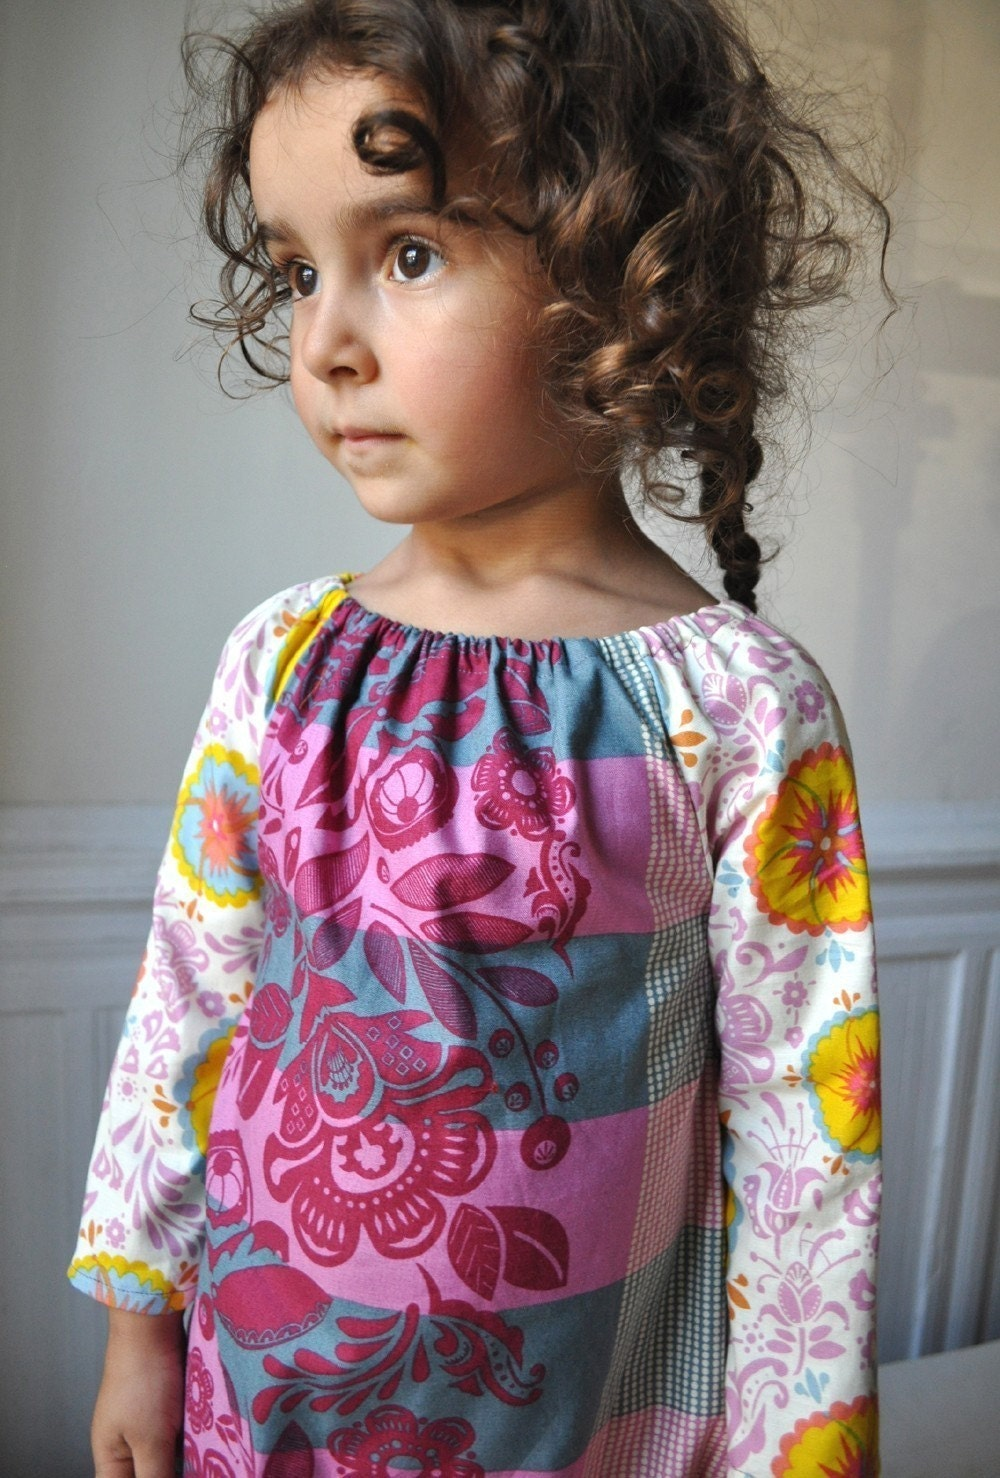 Chic bohemian dress by ManiMina's on Etsy